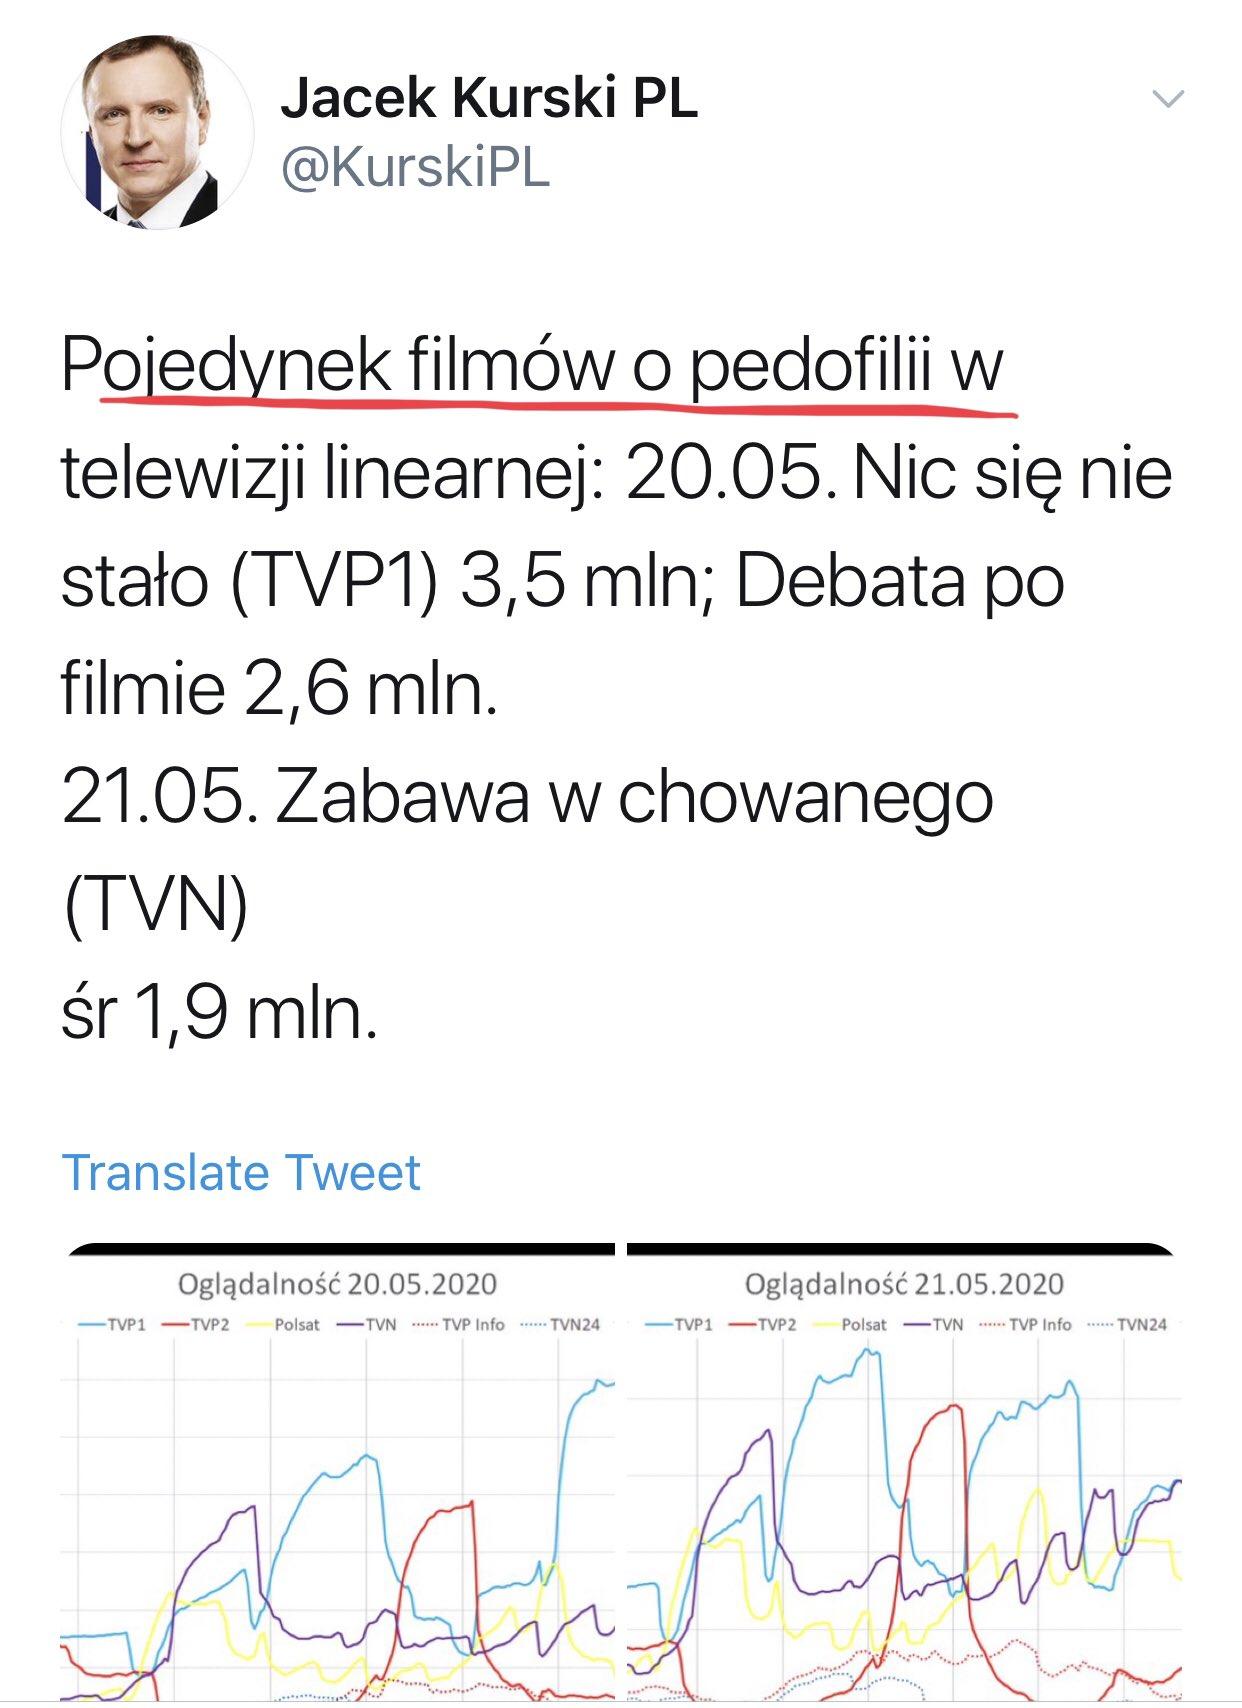 https://pbs.twimg.com/media/EYnohlAXkAEswqY?format=jpg&name=large